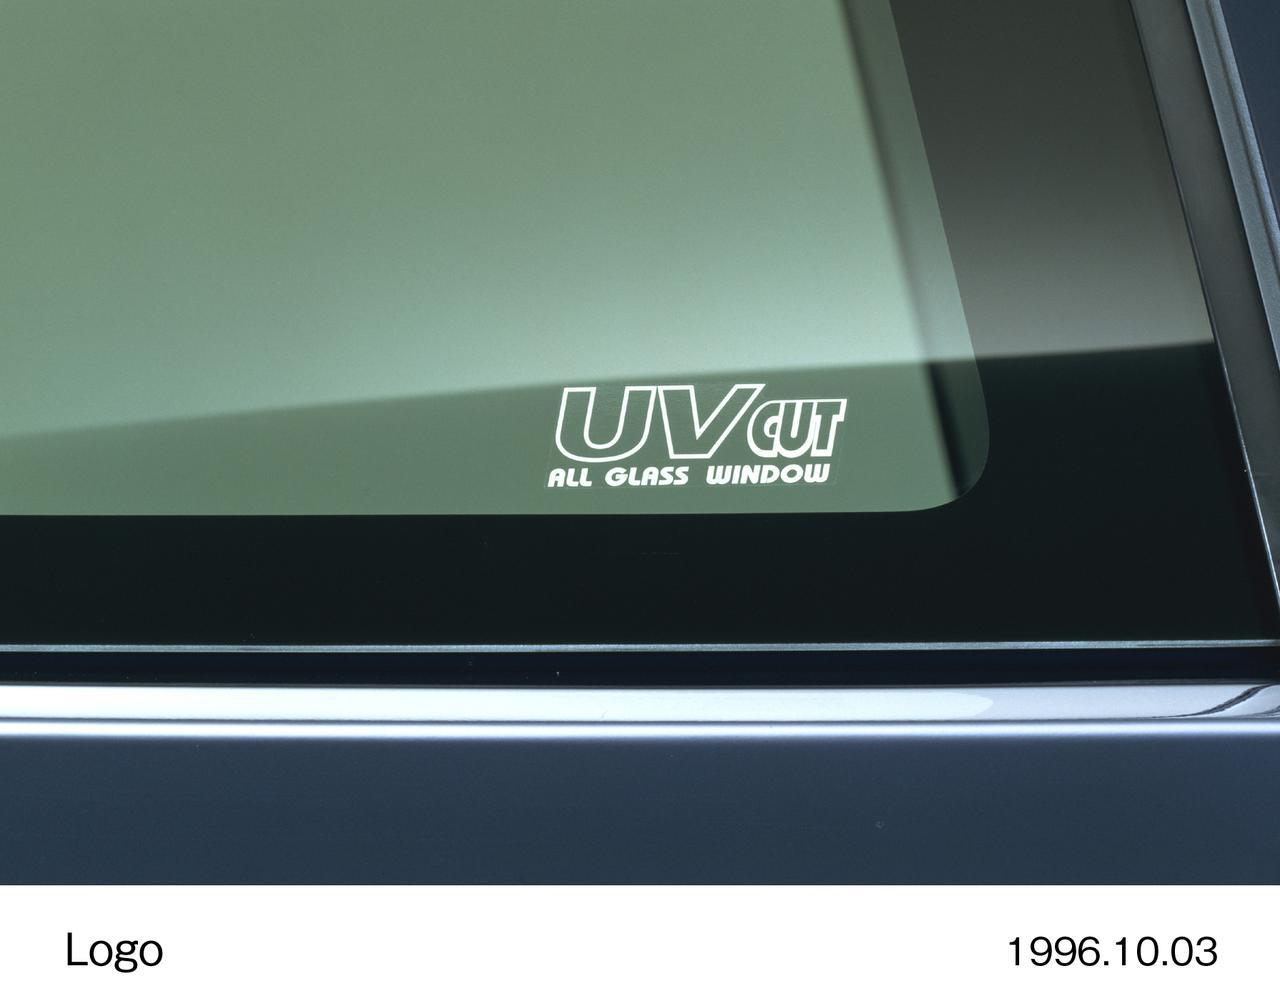 Images : 2番目の画像 - ホンダロゴ関連の画像はこちら(クリックして拡大) - A Little Honda | ア・リトル・ホンダ(リトホン)